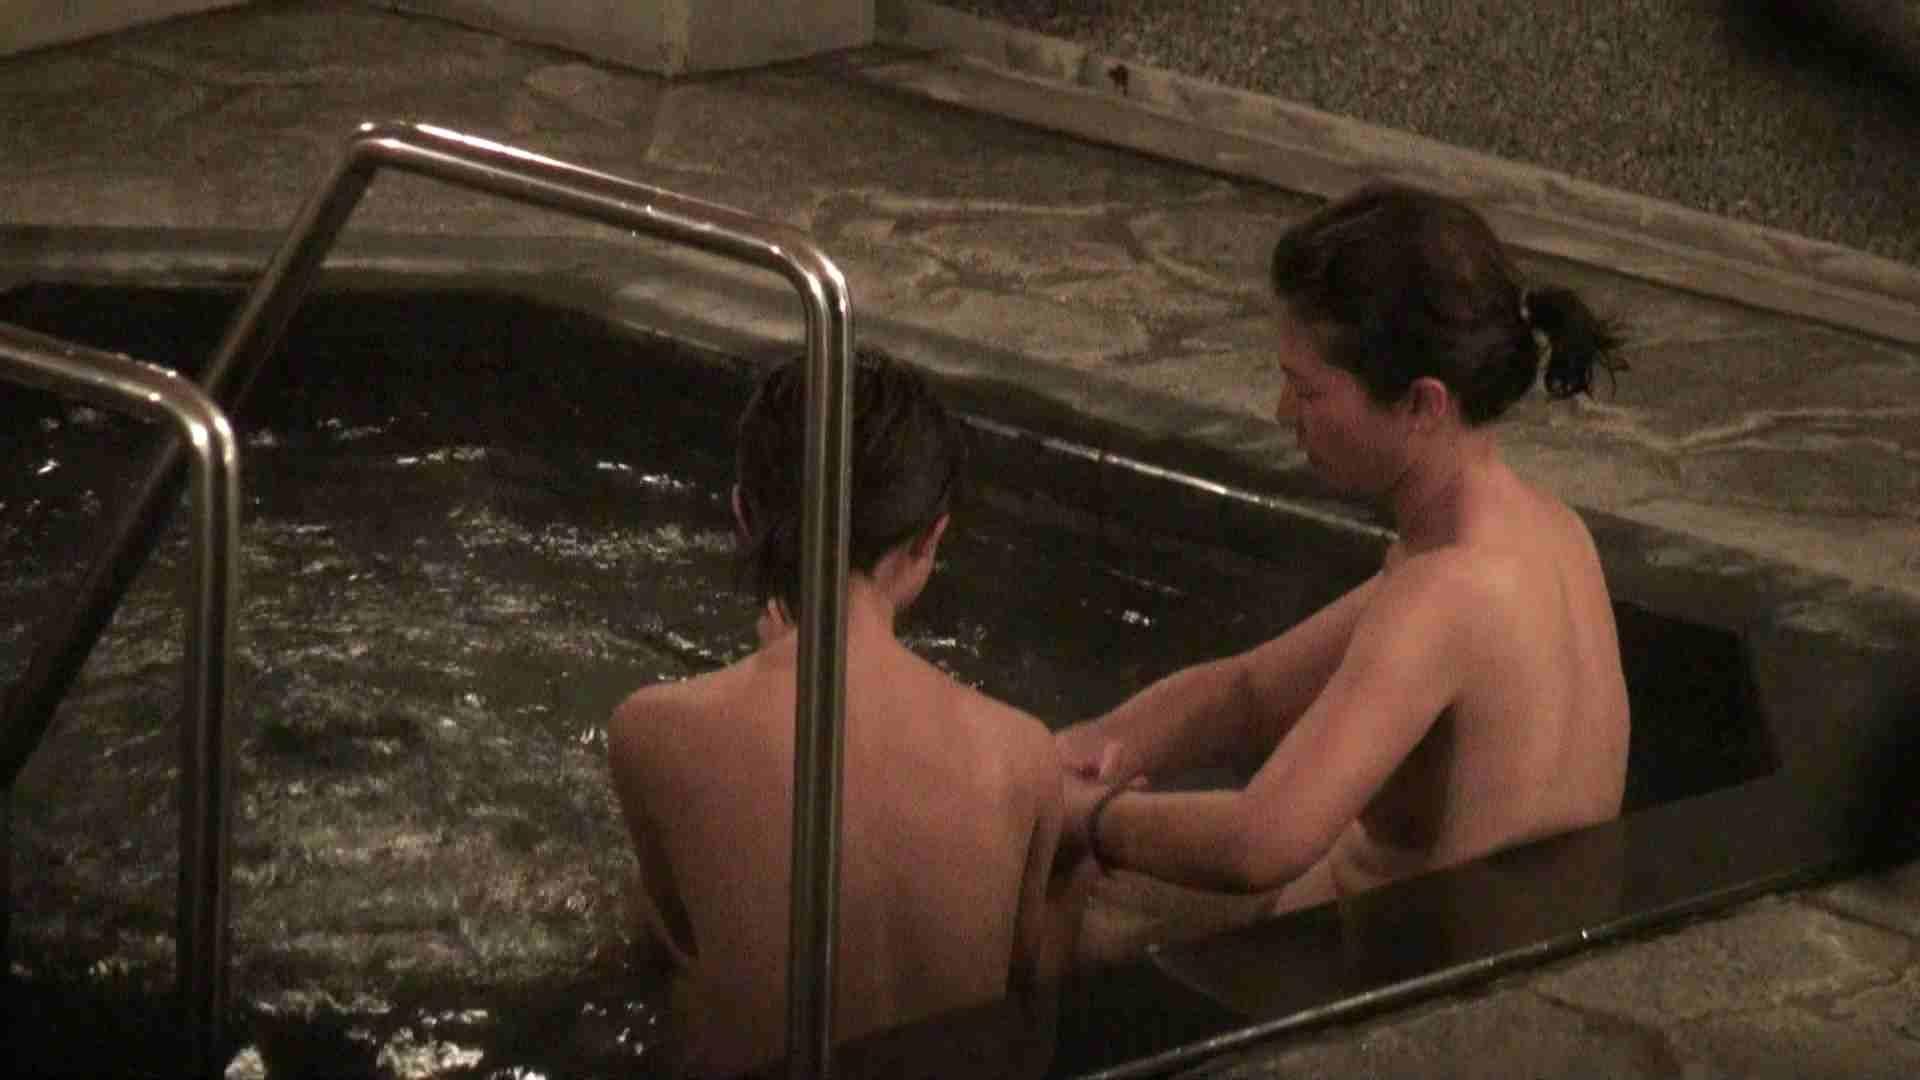 Aquaな露天風呂Vol.435 OLのプライベート 性交動画流出 13pic 2